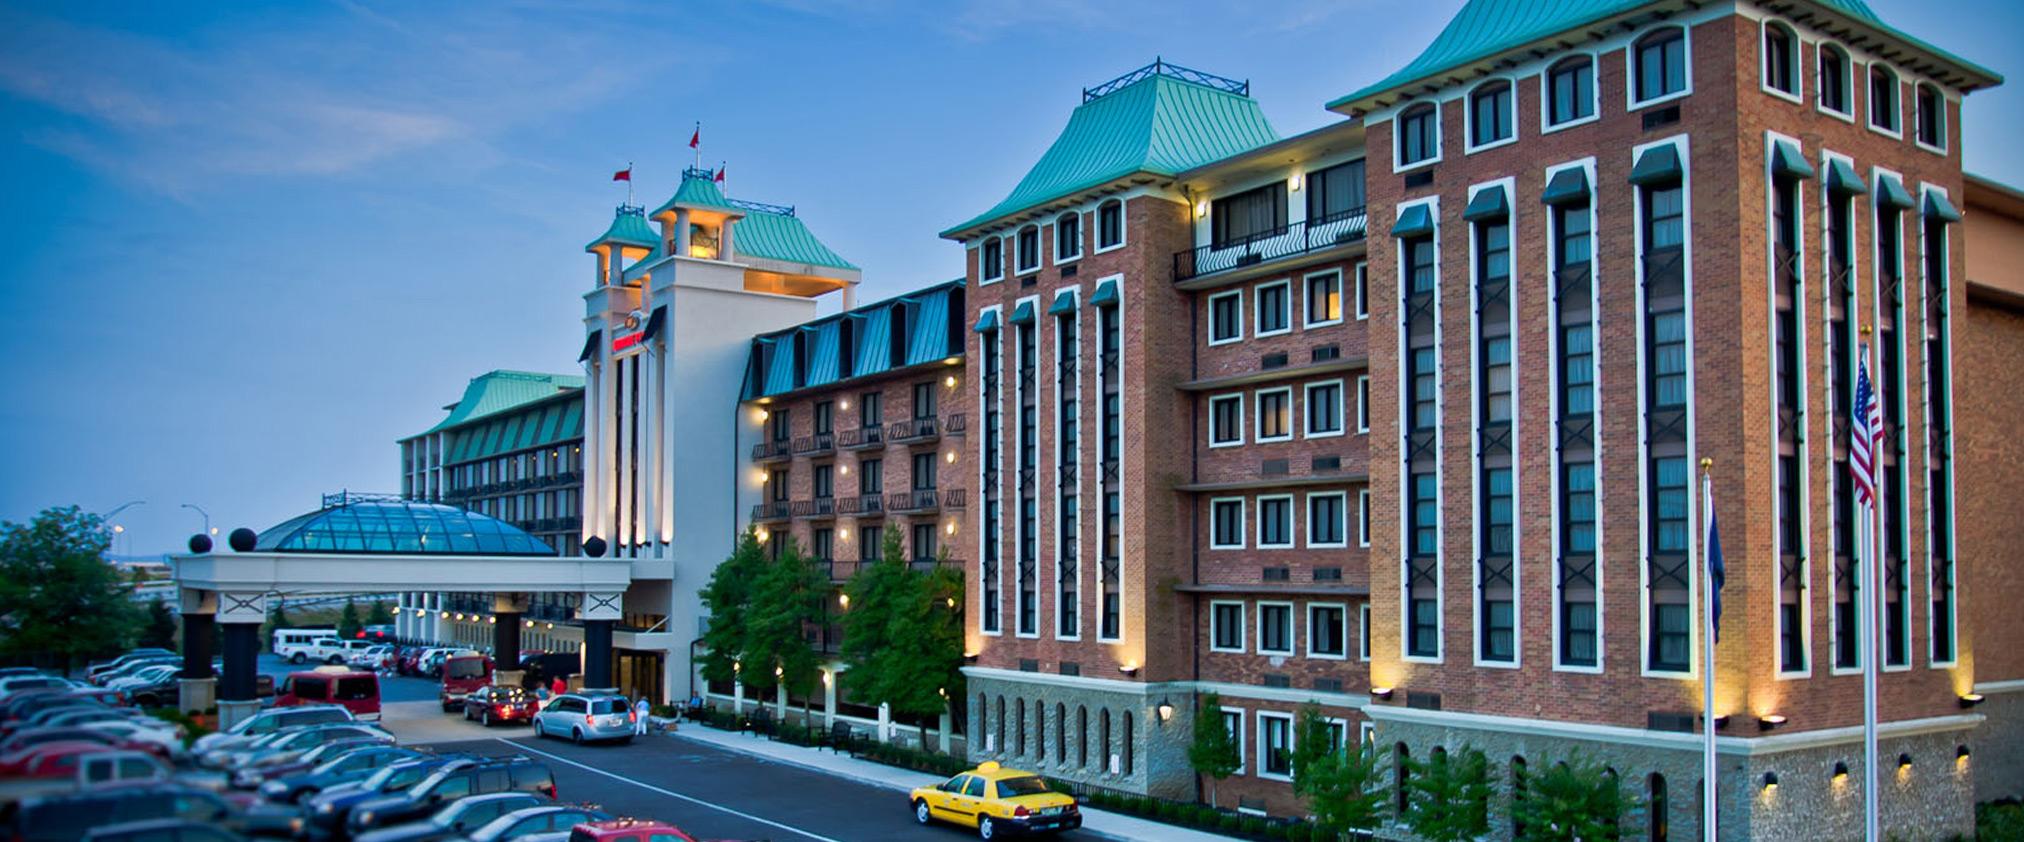 Crowne Plaza Hotel Louisville Kentucky